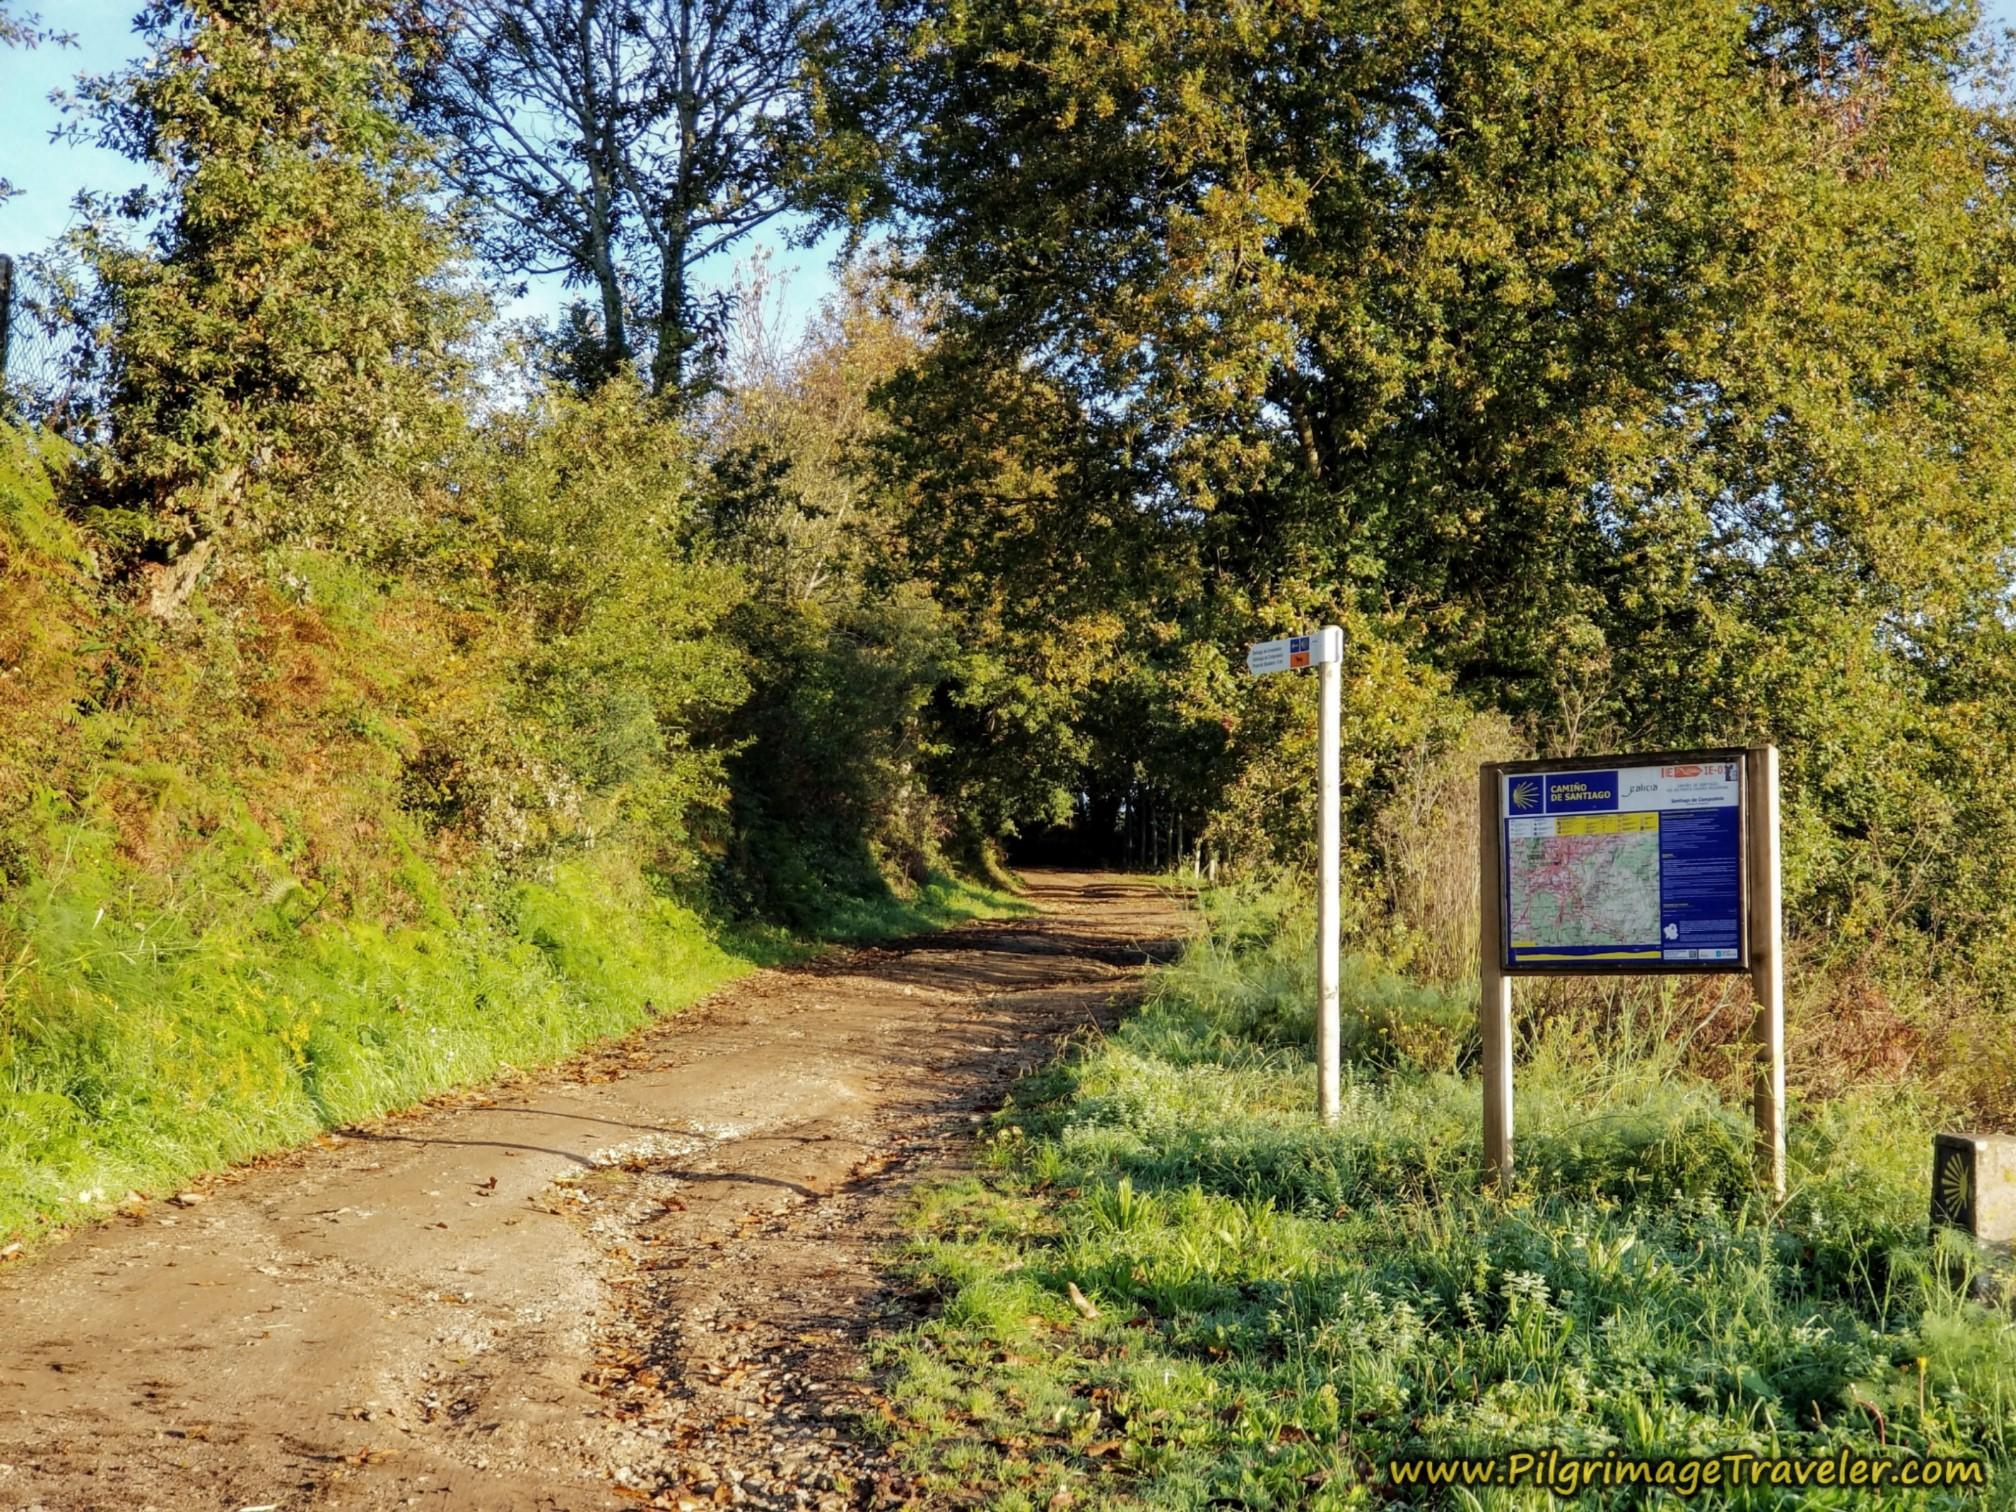 Enter Path System